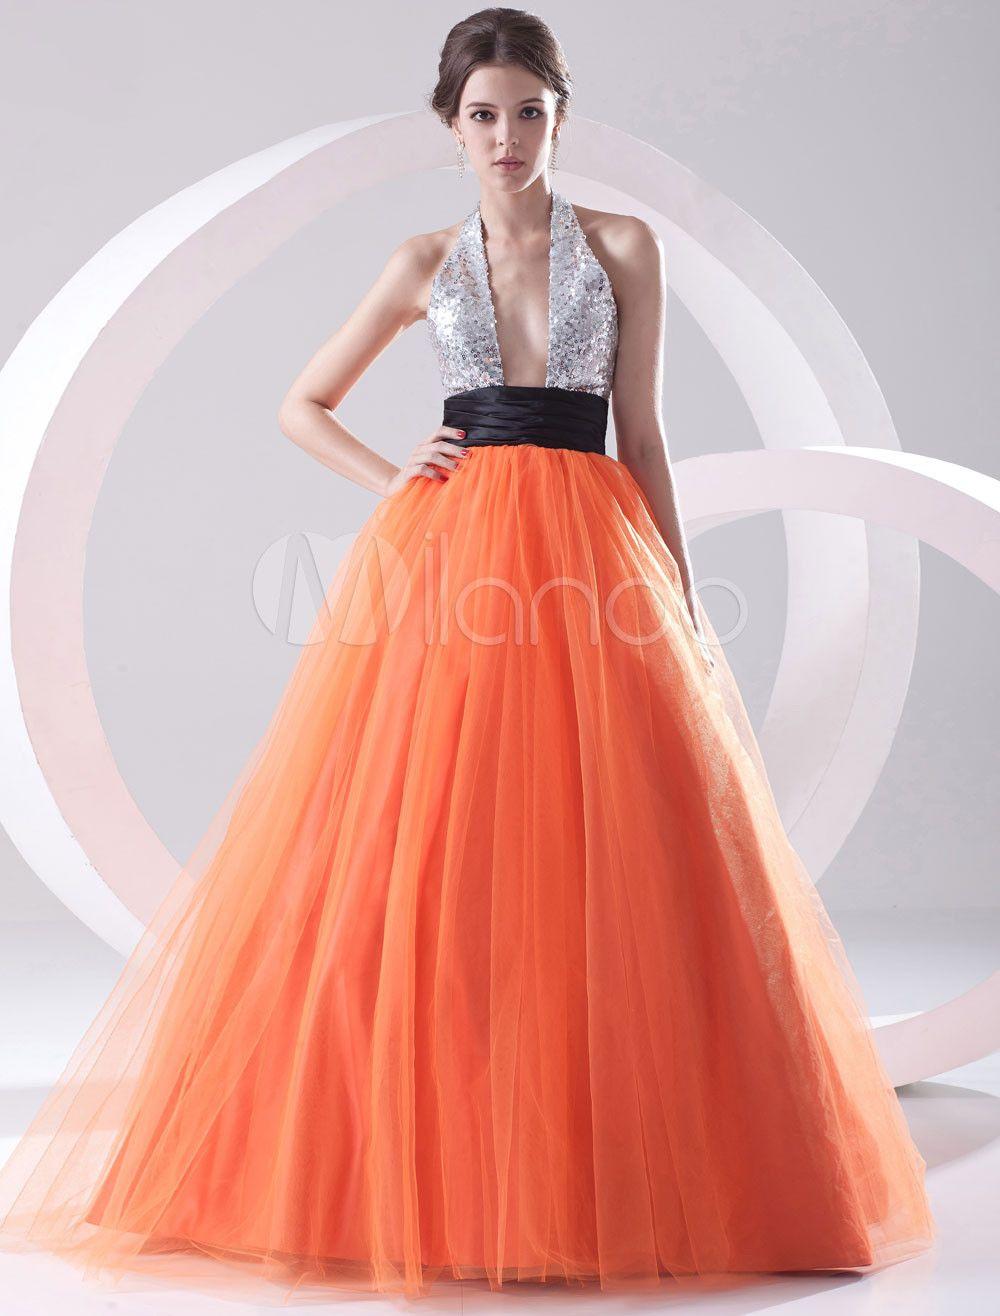 Vestido de fiesta de malla de color naranja con lentejuelas con escote  Halter de estilo de princesa 13ab167e089a